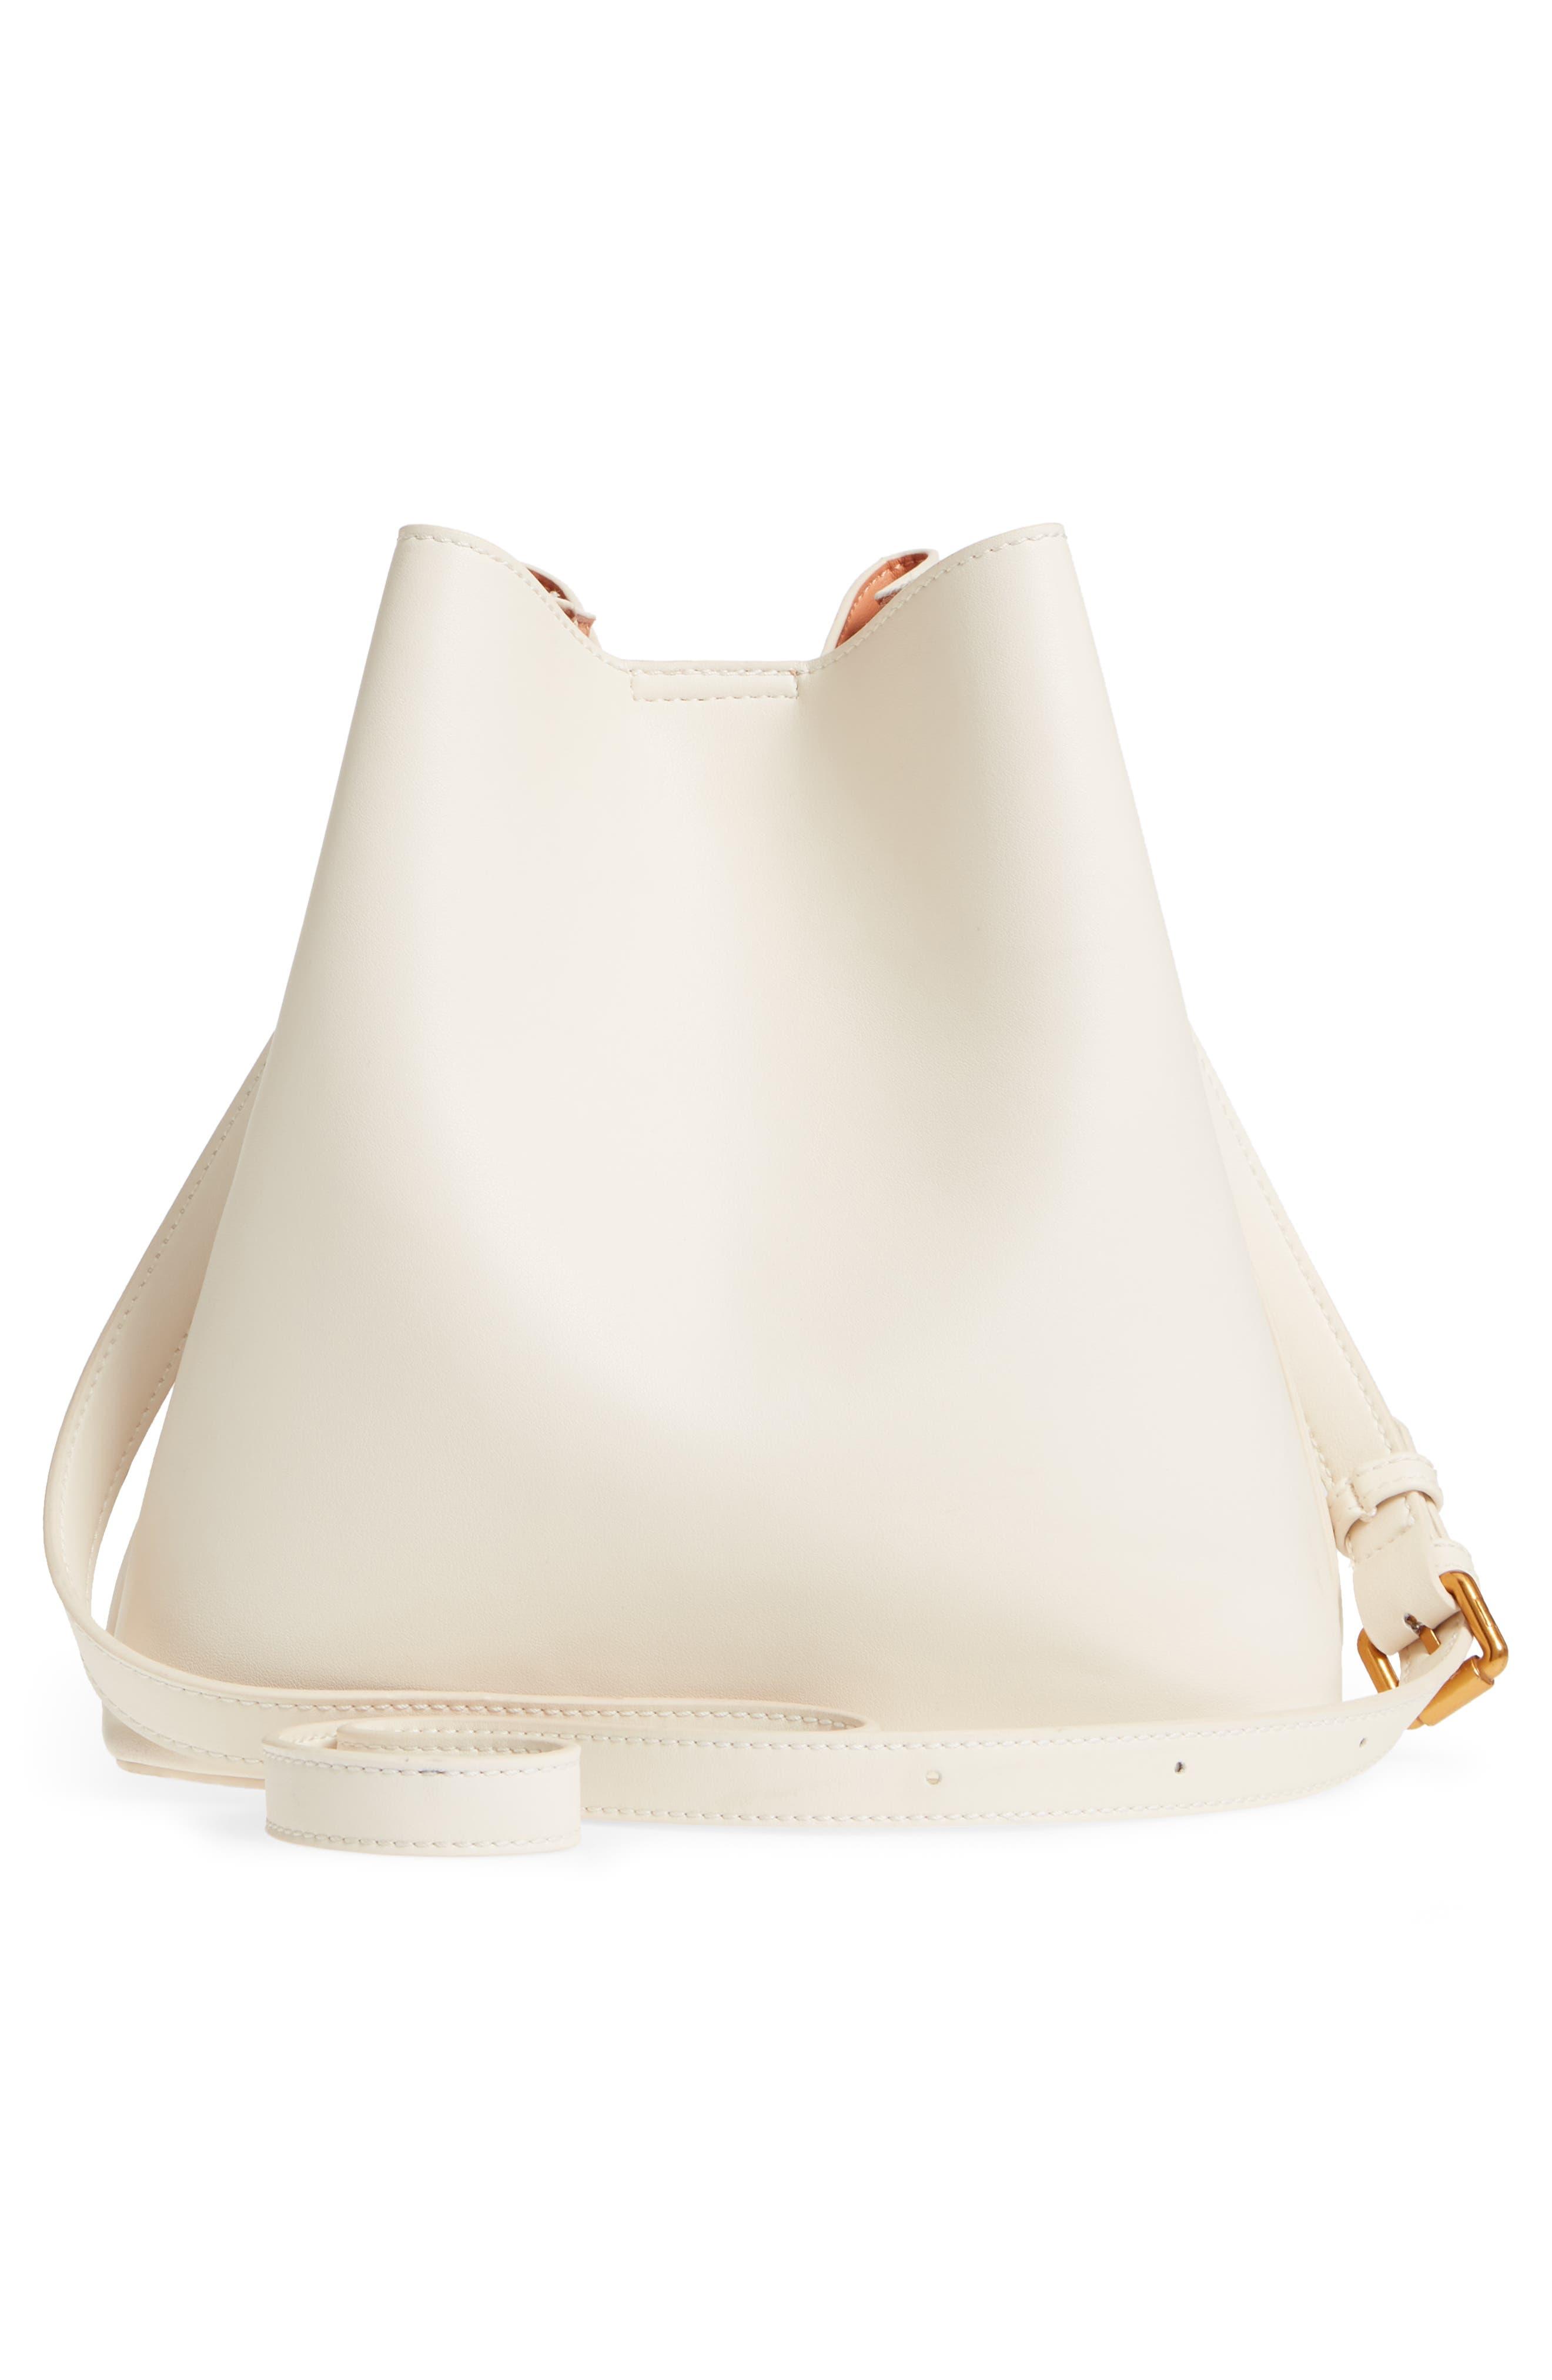 Faux Leather Bucket Tote,                             Alternate thumbnail 7, color,                             White/ Blush